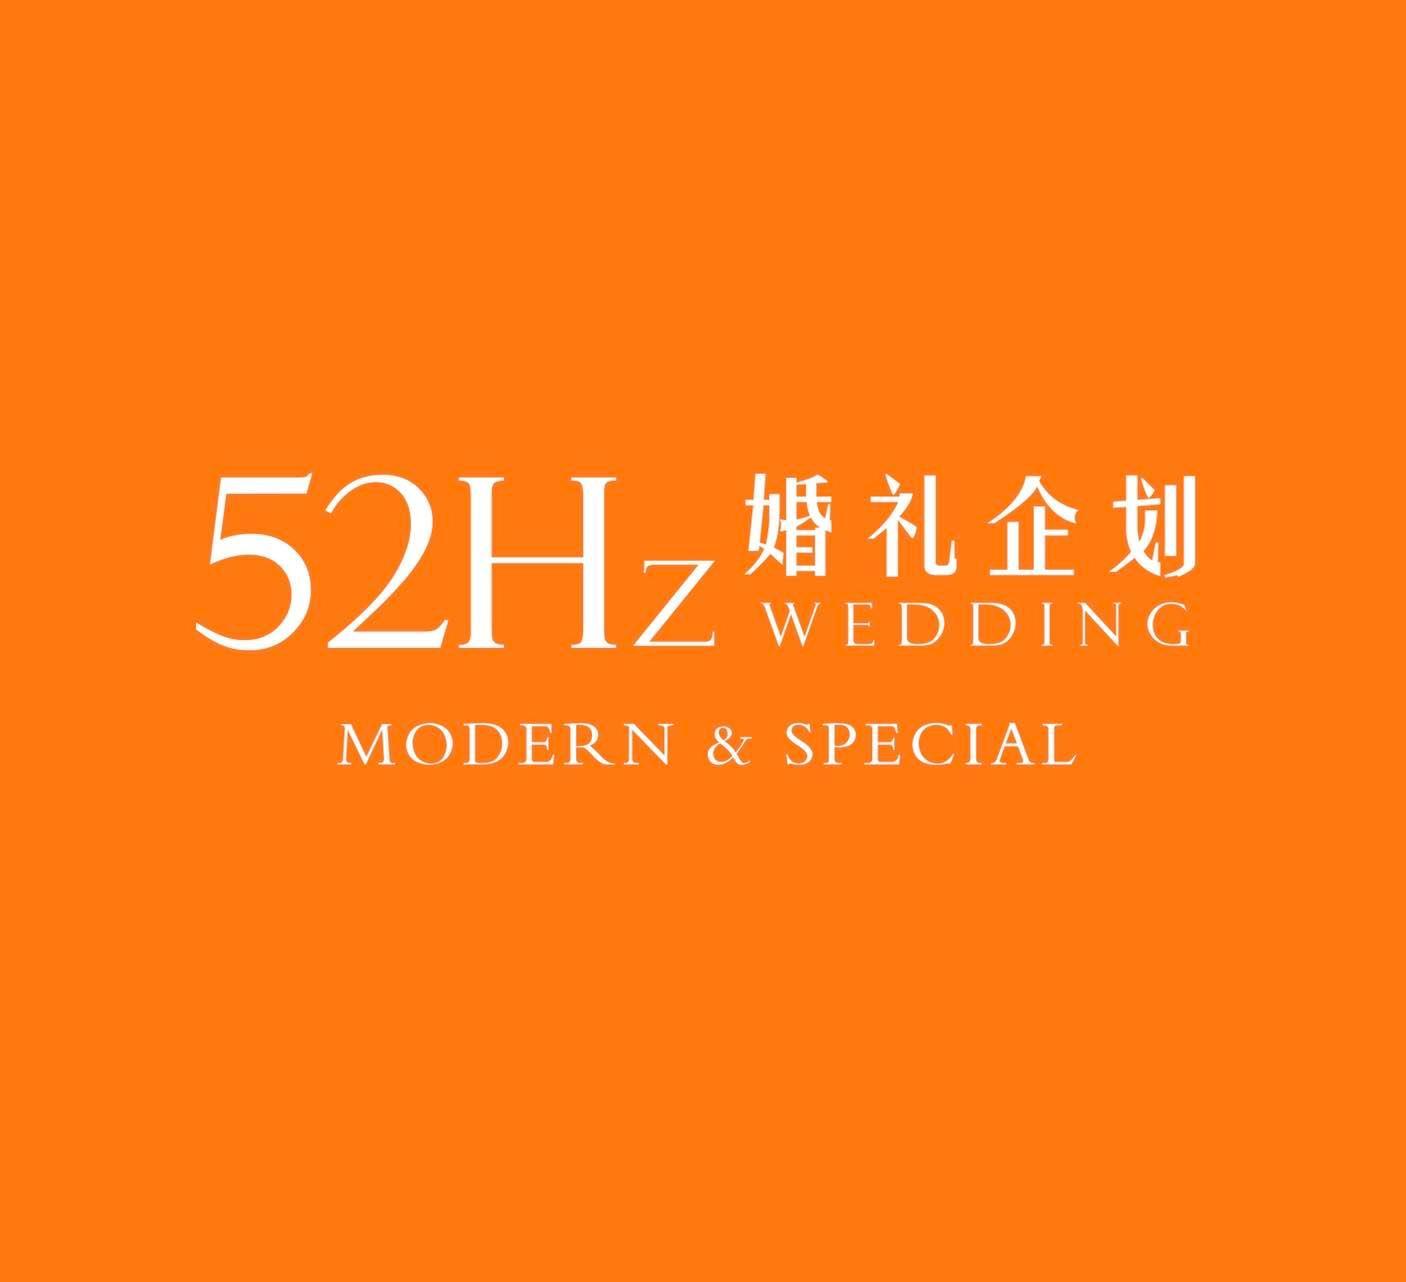 52Hz婚礼企划